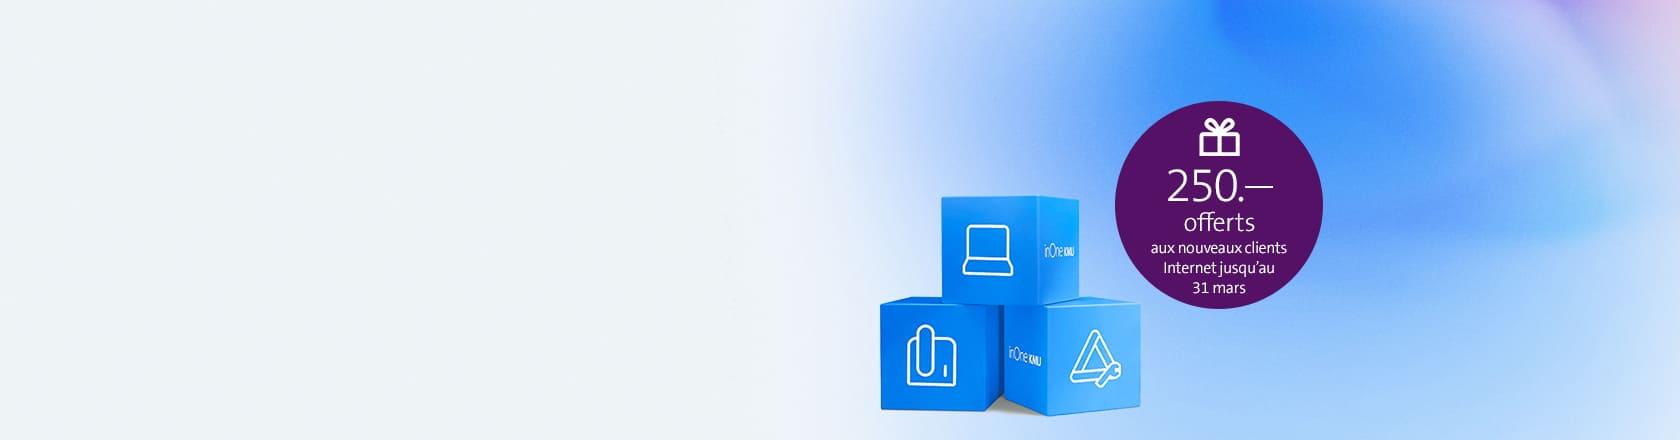 inone pme offre combin e business internet service t l phonie mobile. Black Bedroom Furniture Sets. Home Design Ideas